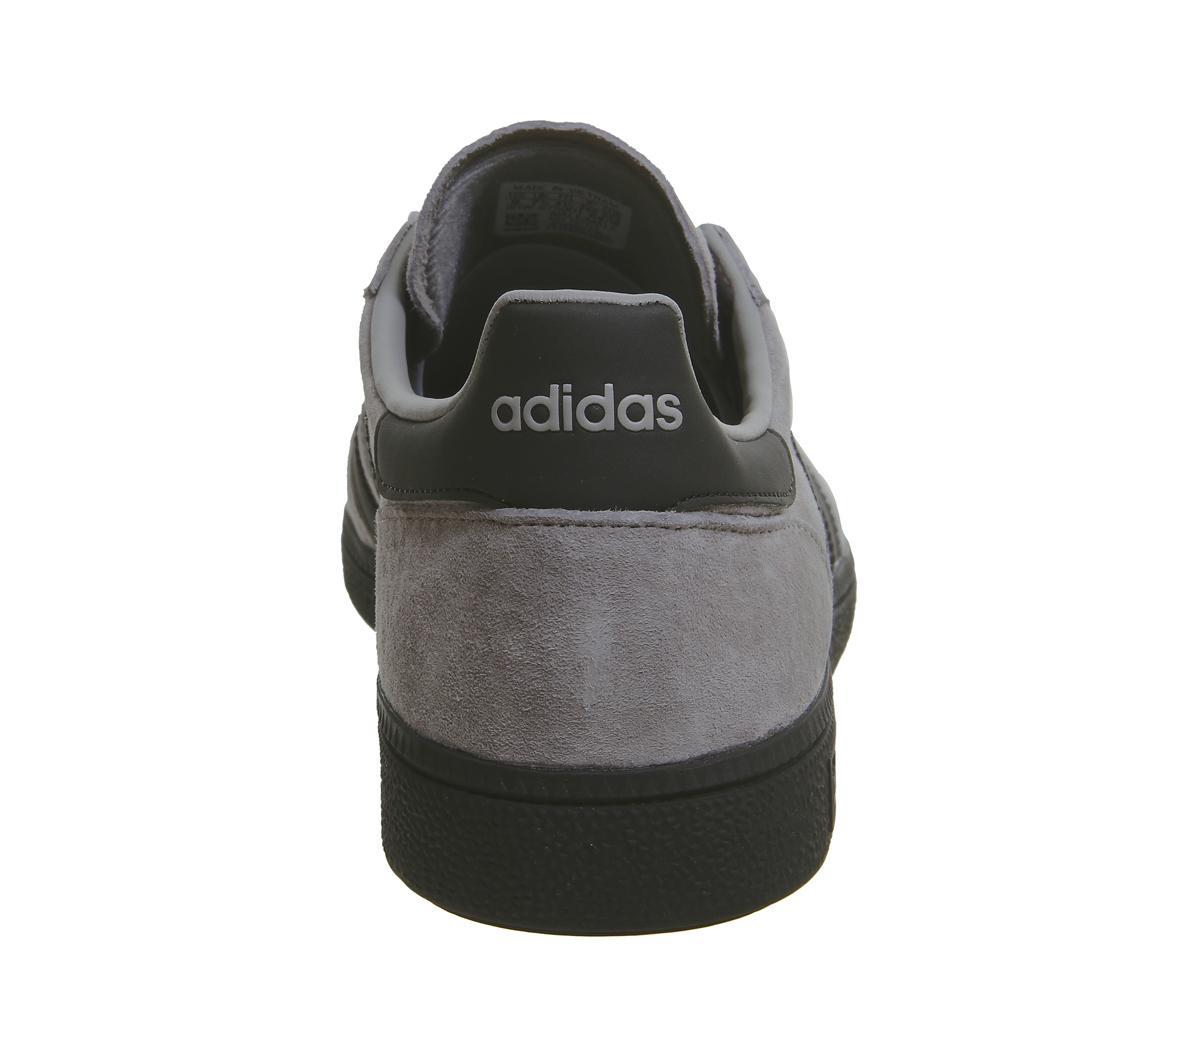 adidas Handball Spezial Trainers Solid